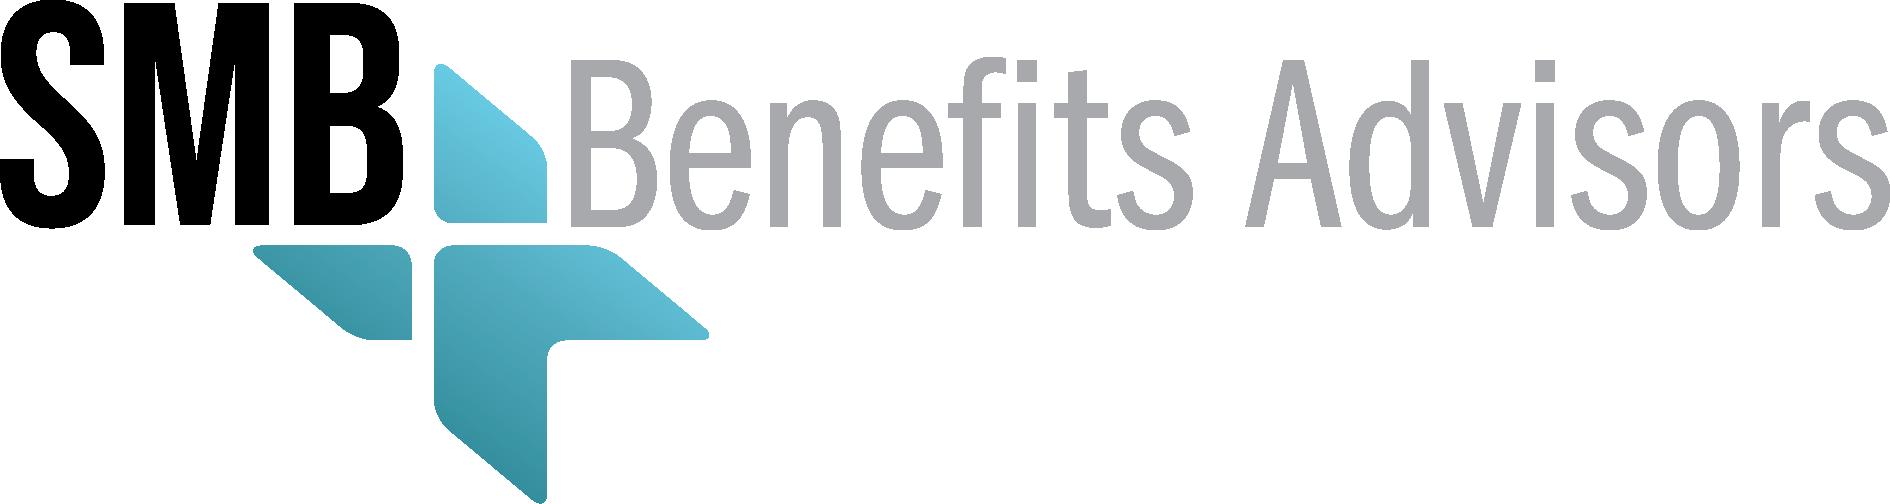 SMB Benefits Advisors Logo